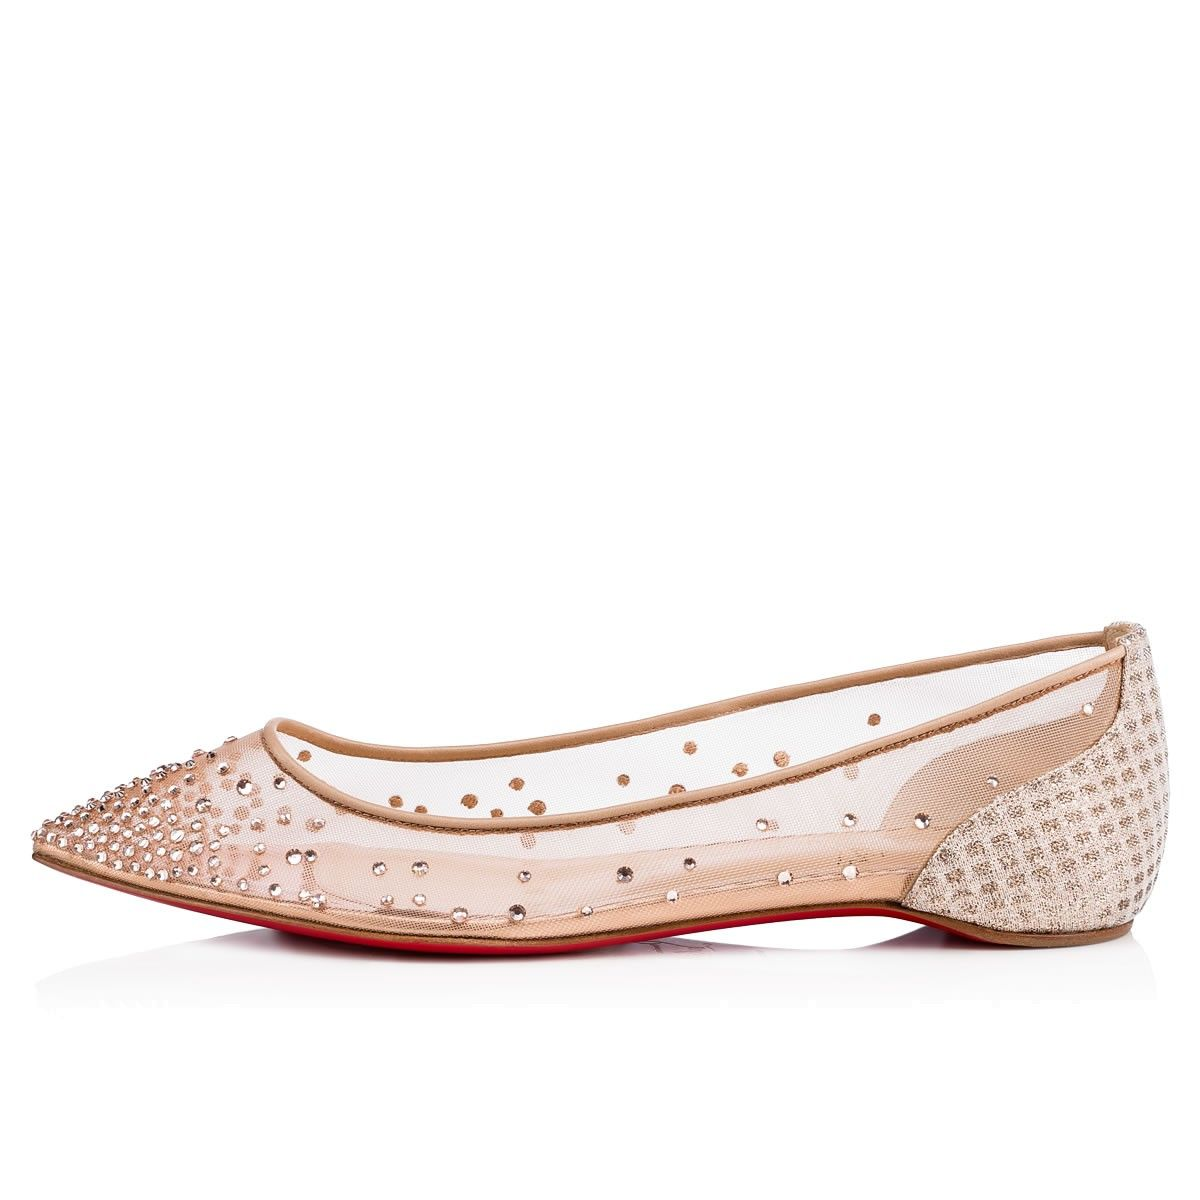 8fb7d53e21e4 Shoes - Follies Strass Flat - Christian Louboutin